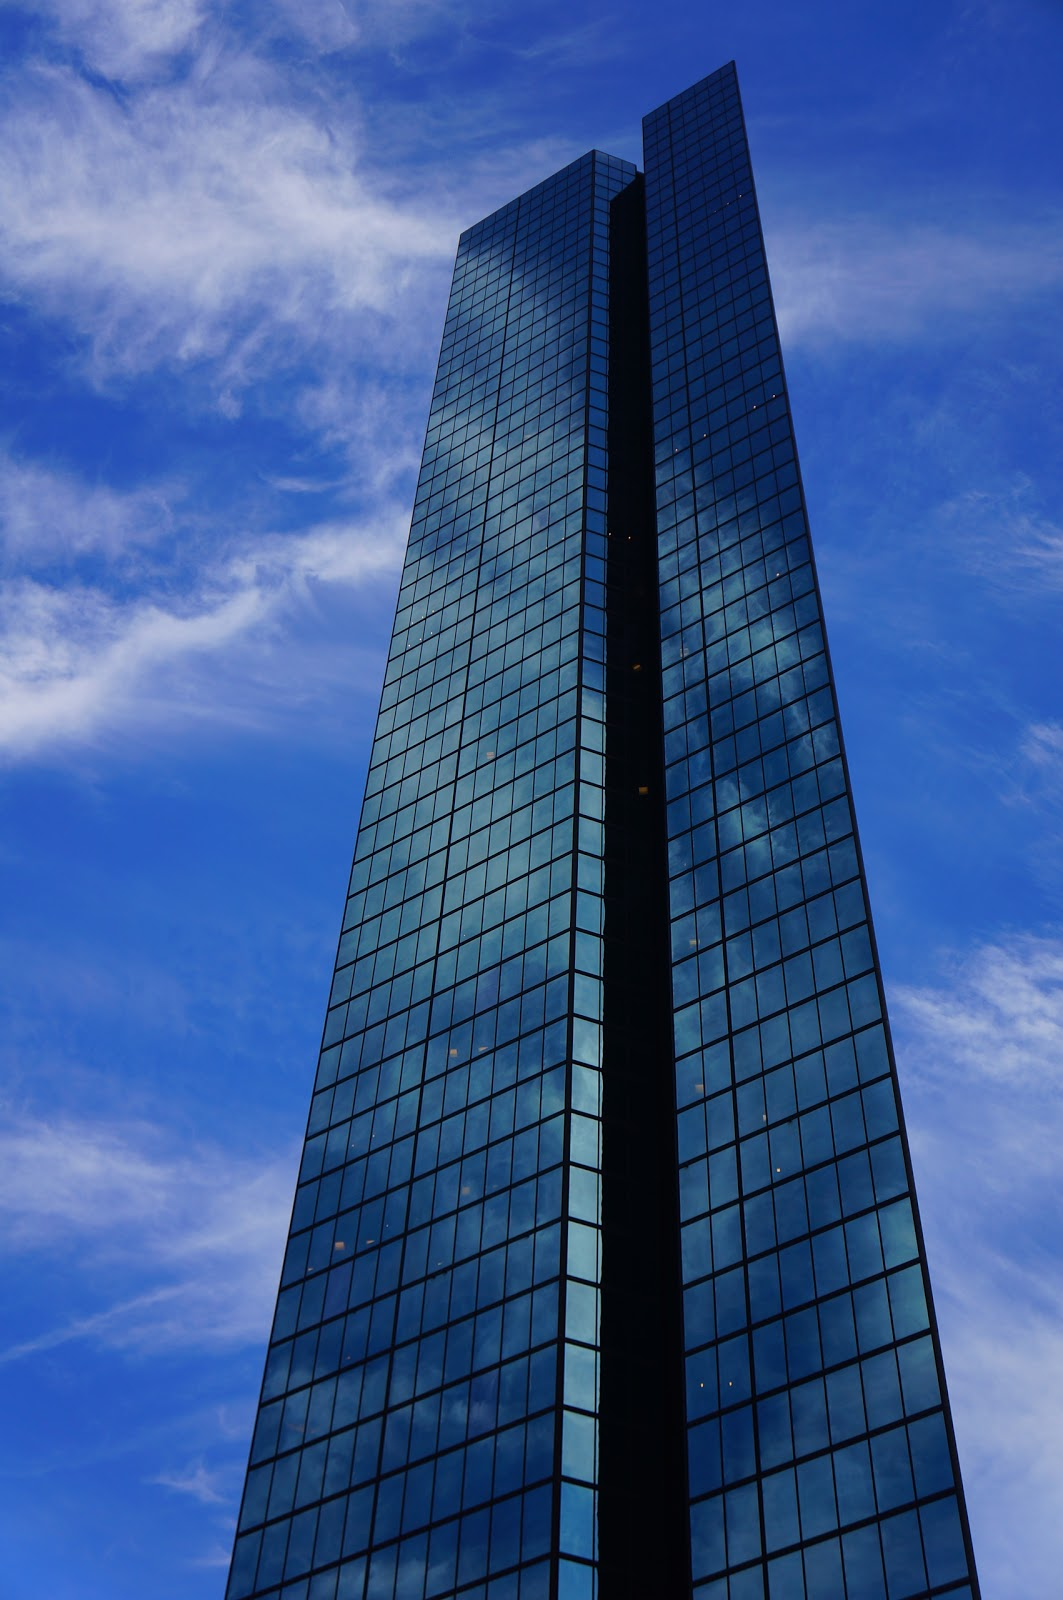 Brad'S Photo Blog: John Hancock Tower